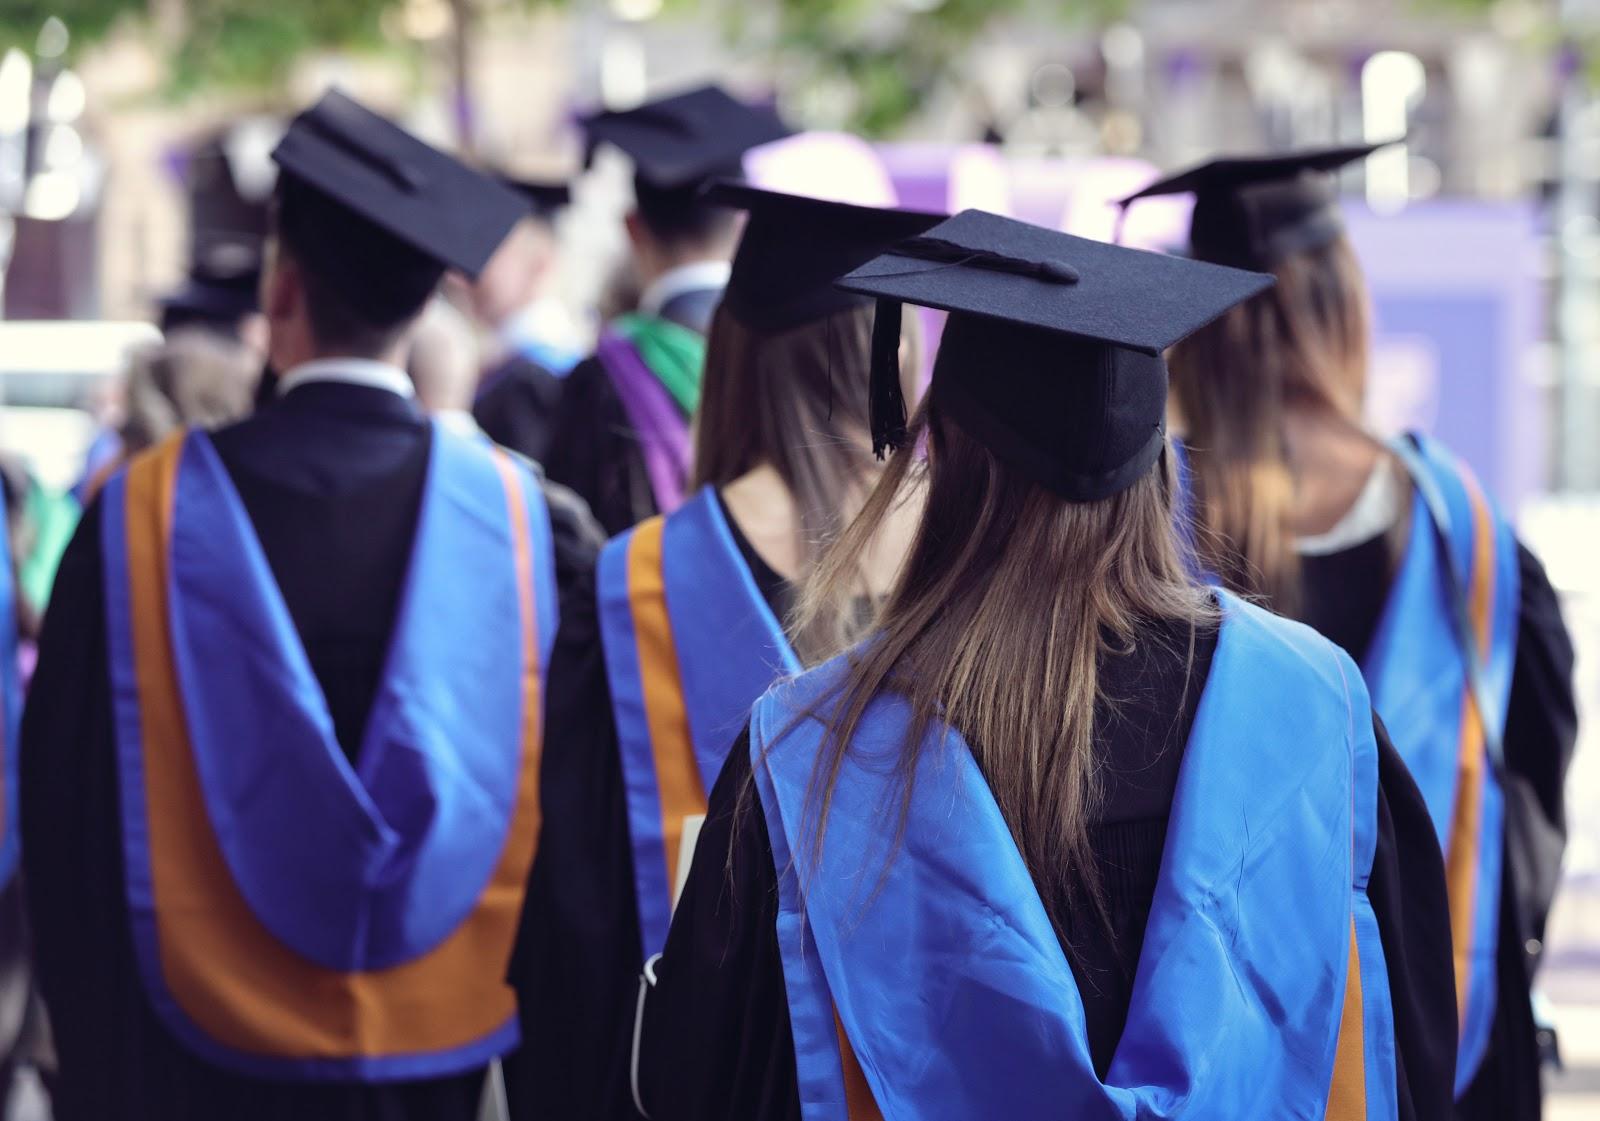 Doctorate vs PhD: Graduates wearing toga